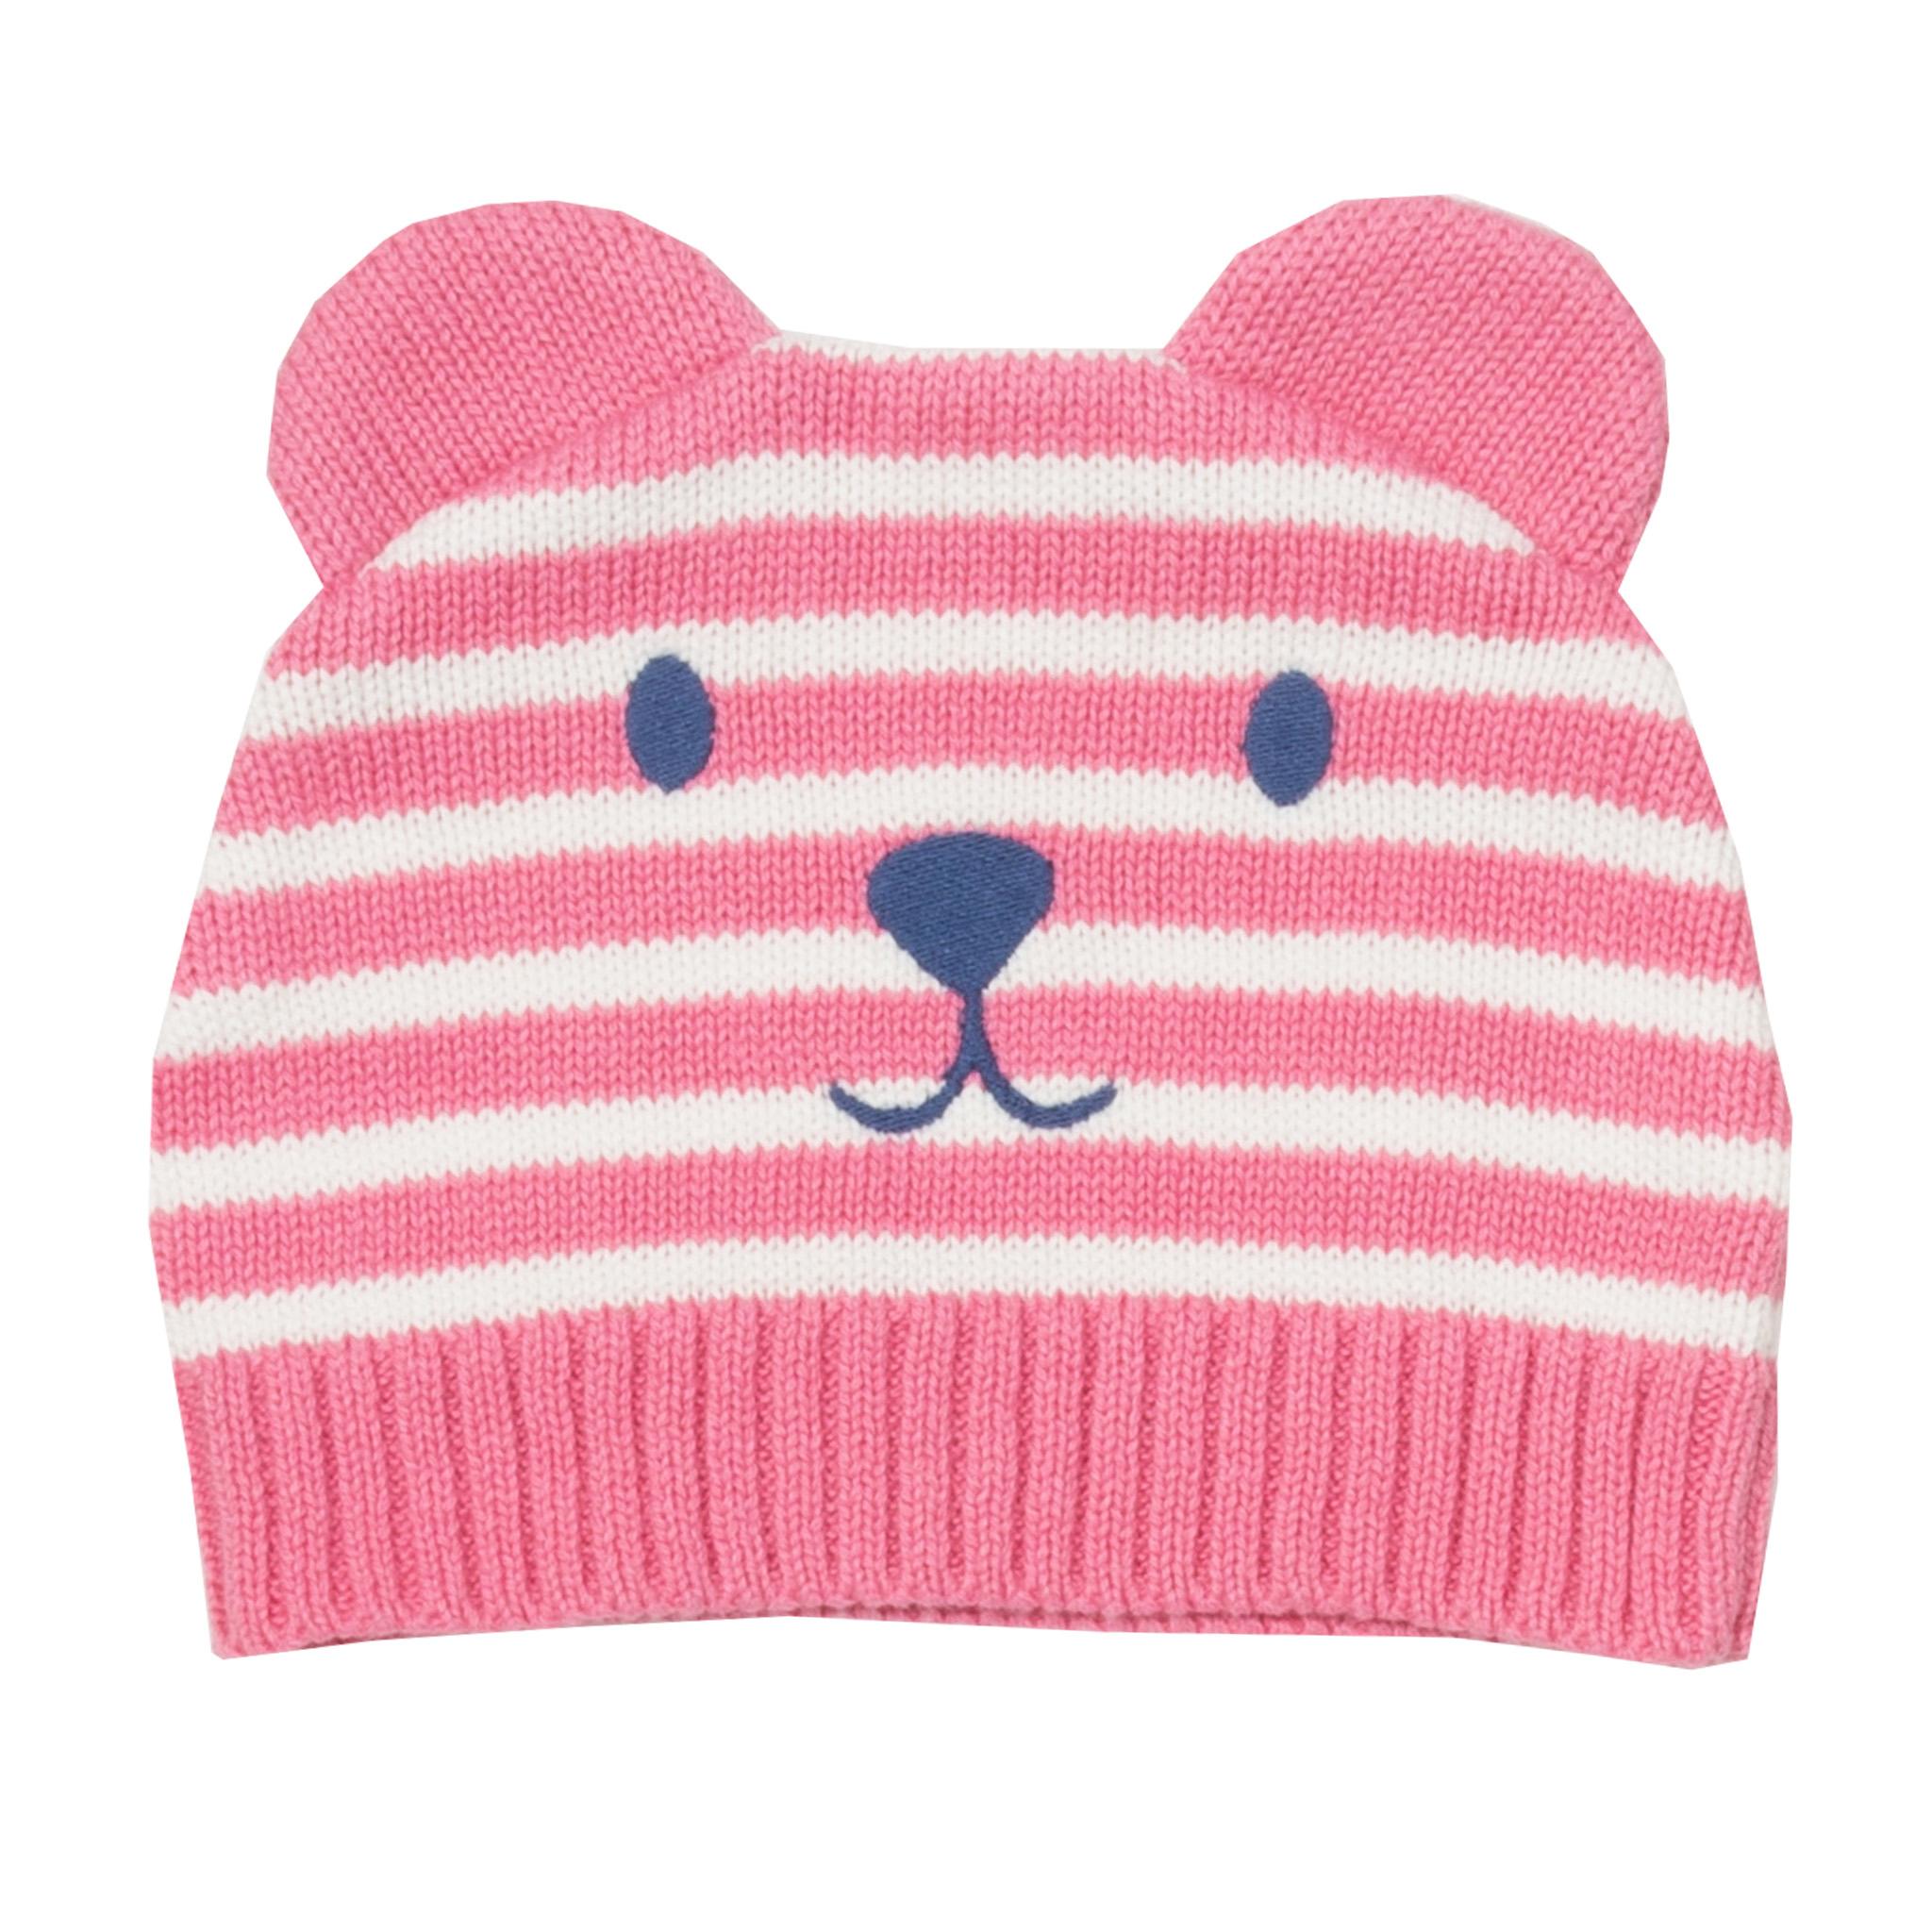 Kite Teddy Knit Hat-Rose